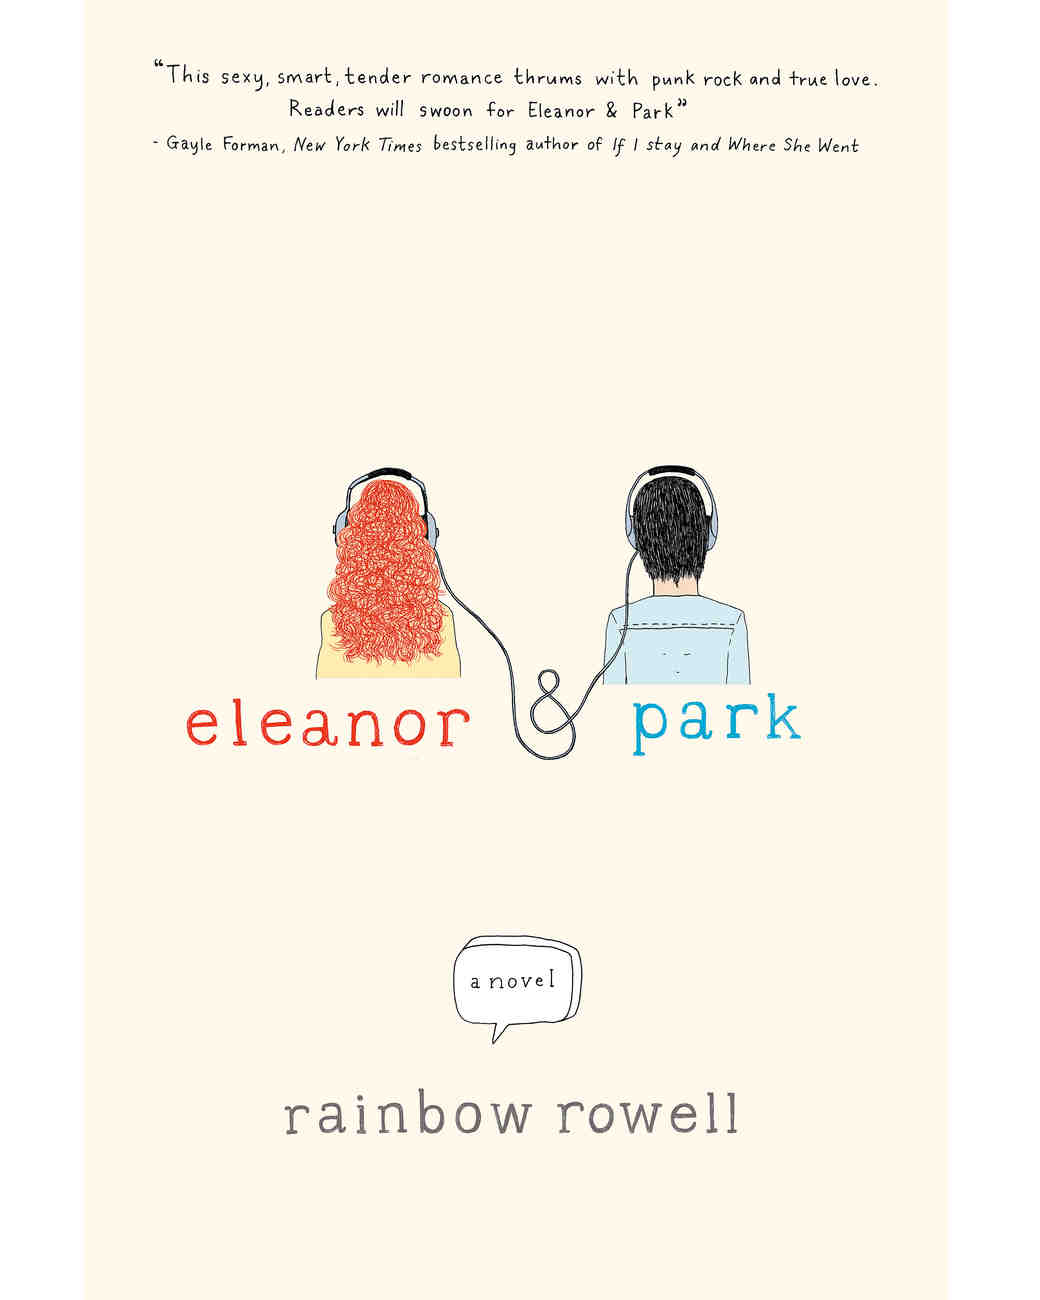 books-read-before-marriage-eleanor-park-rowell-0115.jpg